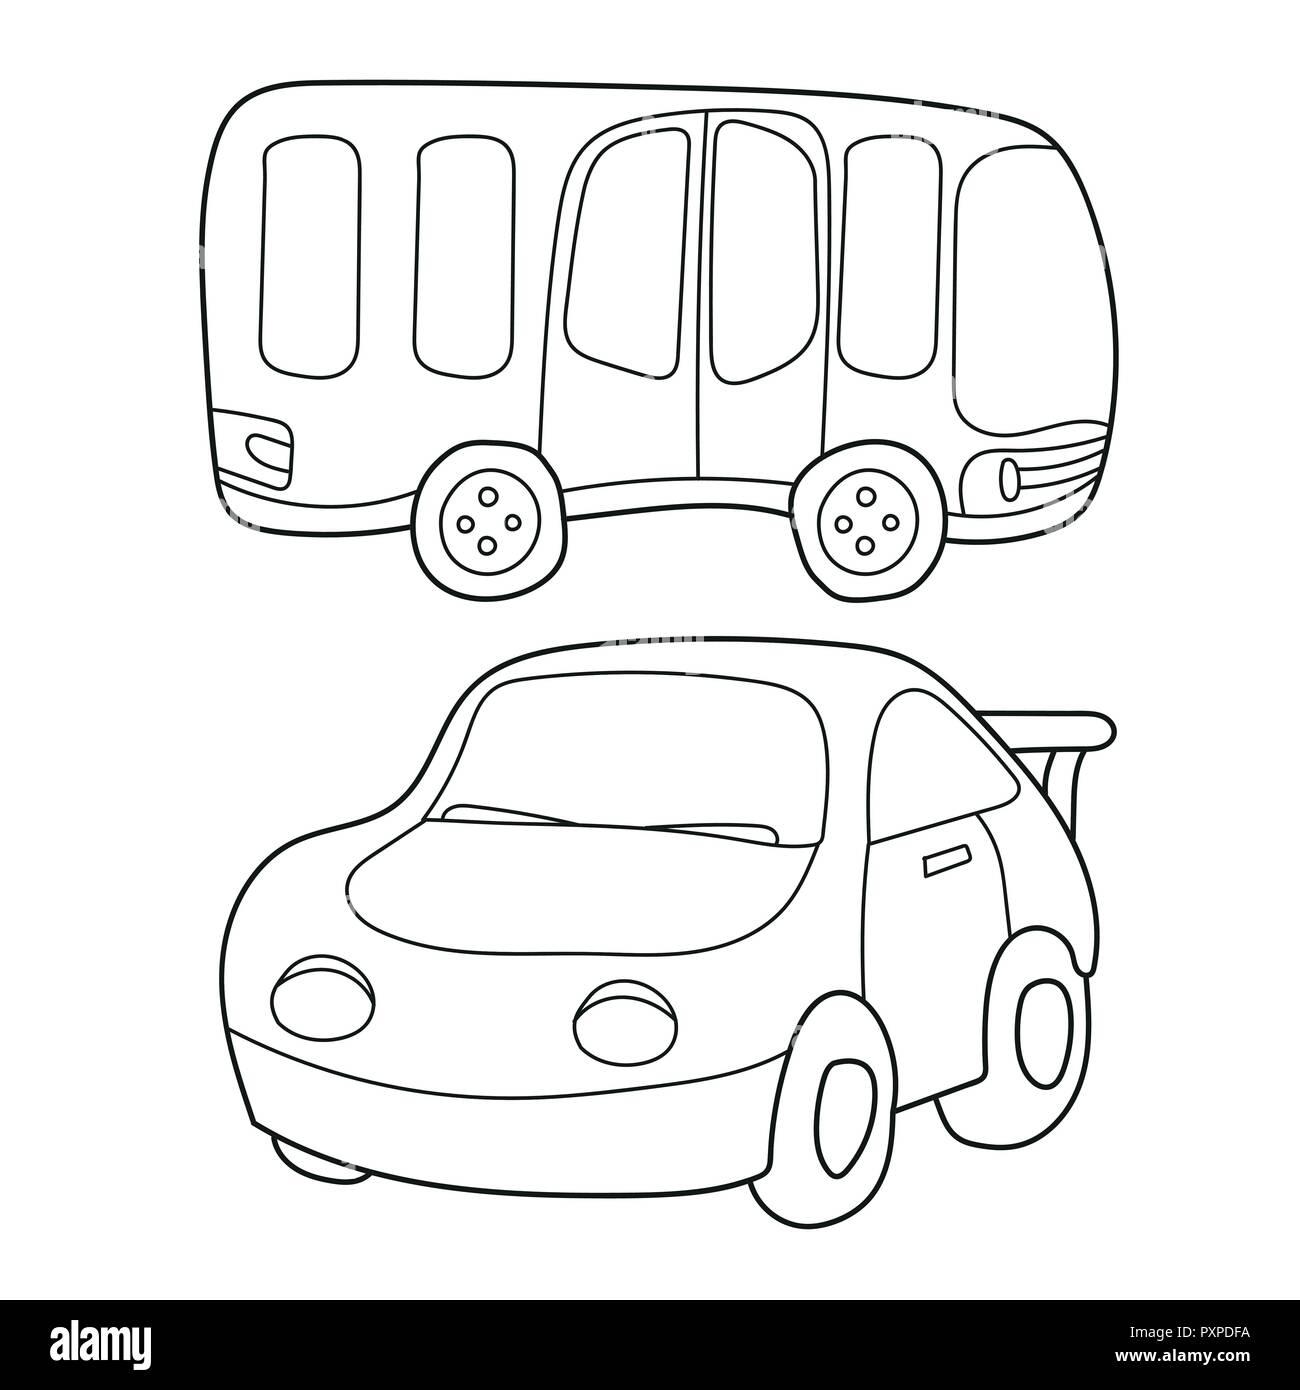 Autobus Illustration Imágenes De Stock Autobus Illustration Fotos